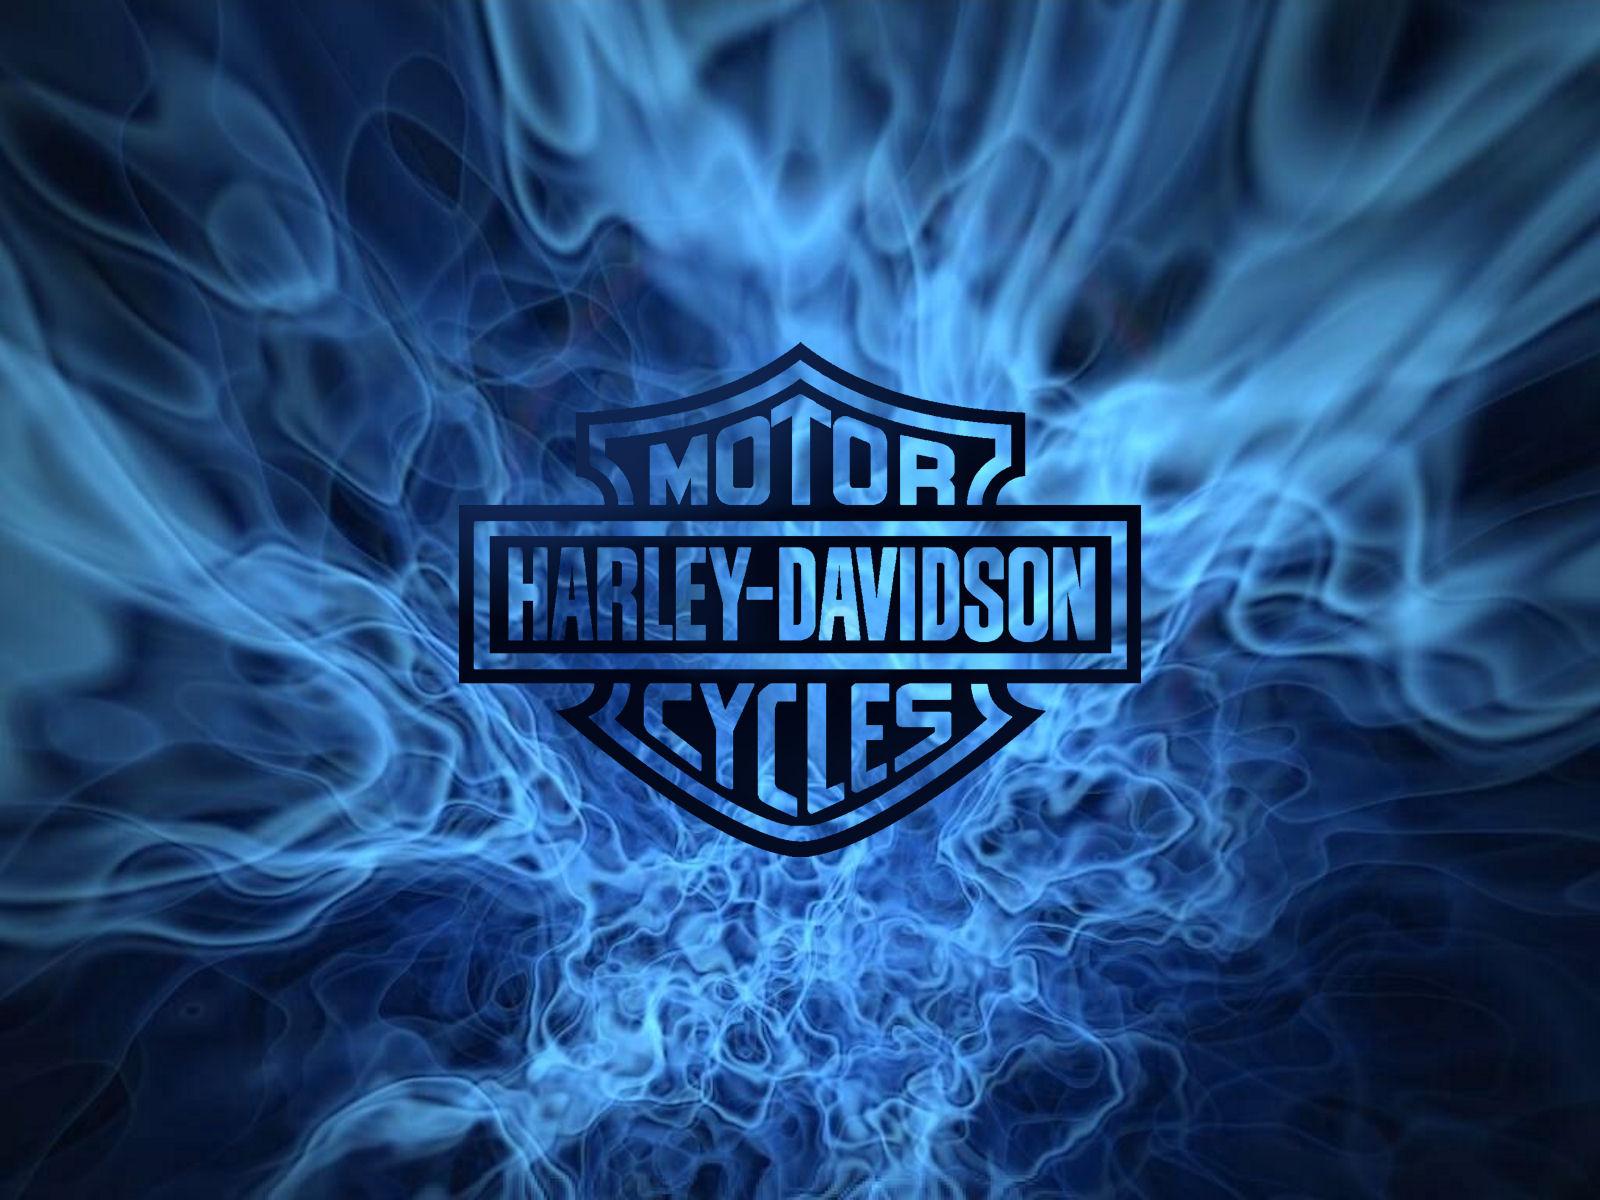 facebook italia Sfondi e Wallpaper Harley Davidson 1600x1200